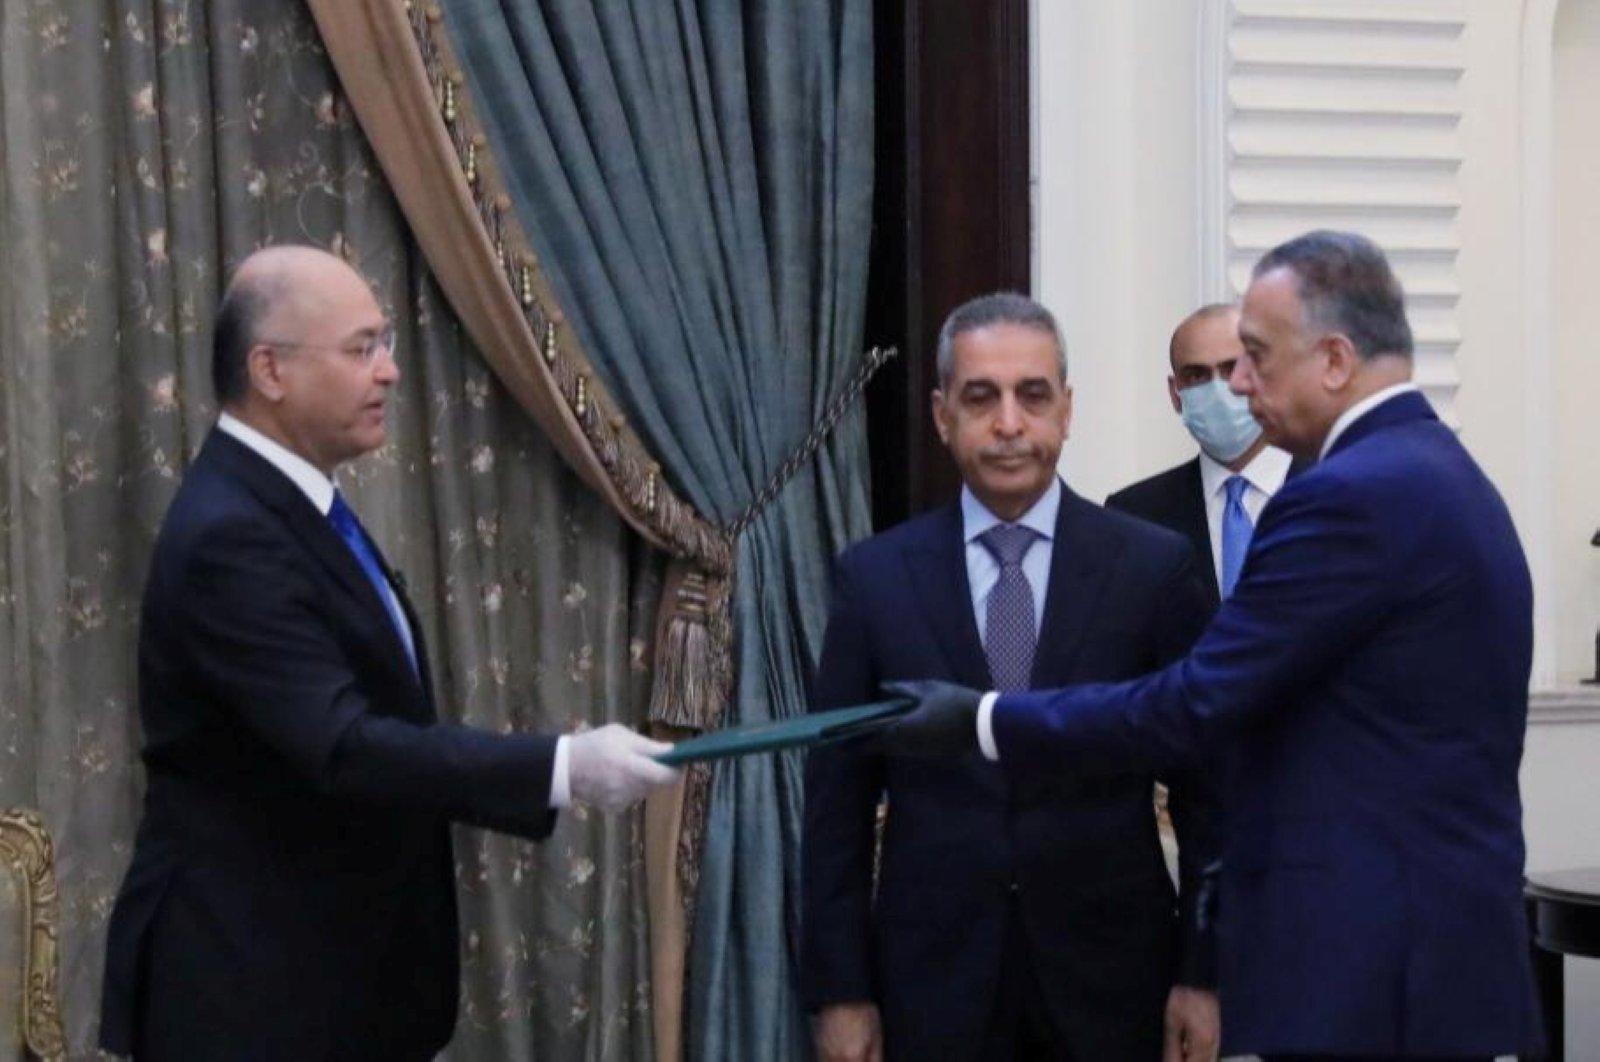 Iraq's President Barham Salih instructs newly appointed Prime Minister Mustafa al-Kadhimi, Baghdad, April 9, 2020. (REUTERS Photo)